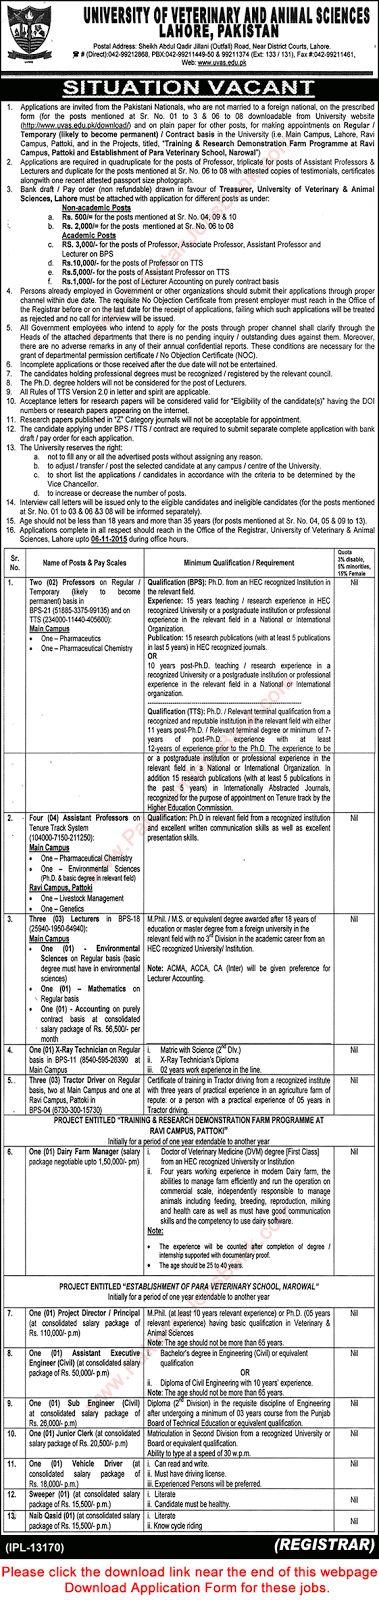 Jobs in Pakistan: University of Veterinary and Animal Sciences Jobs ...